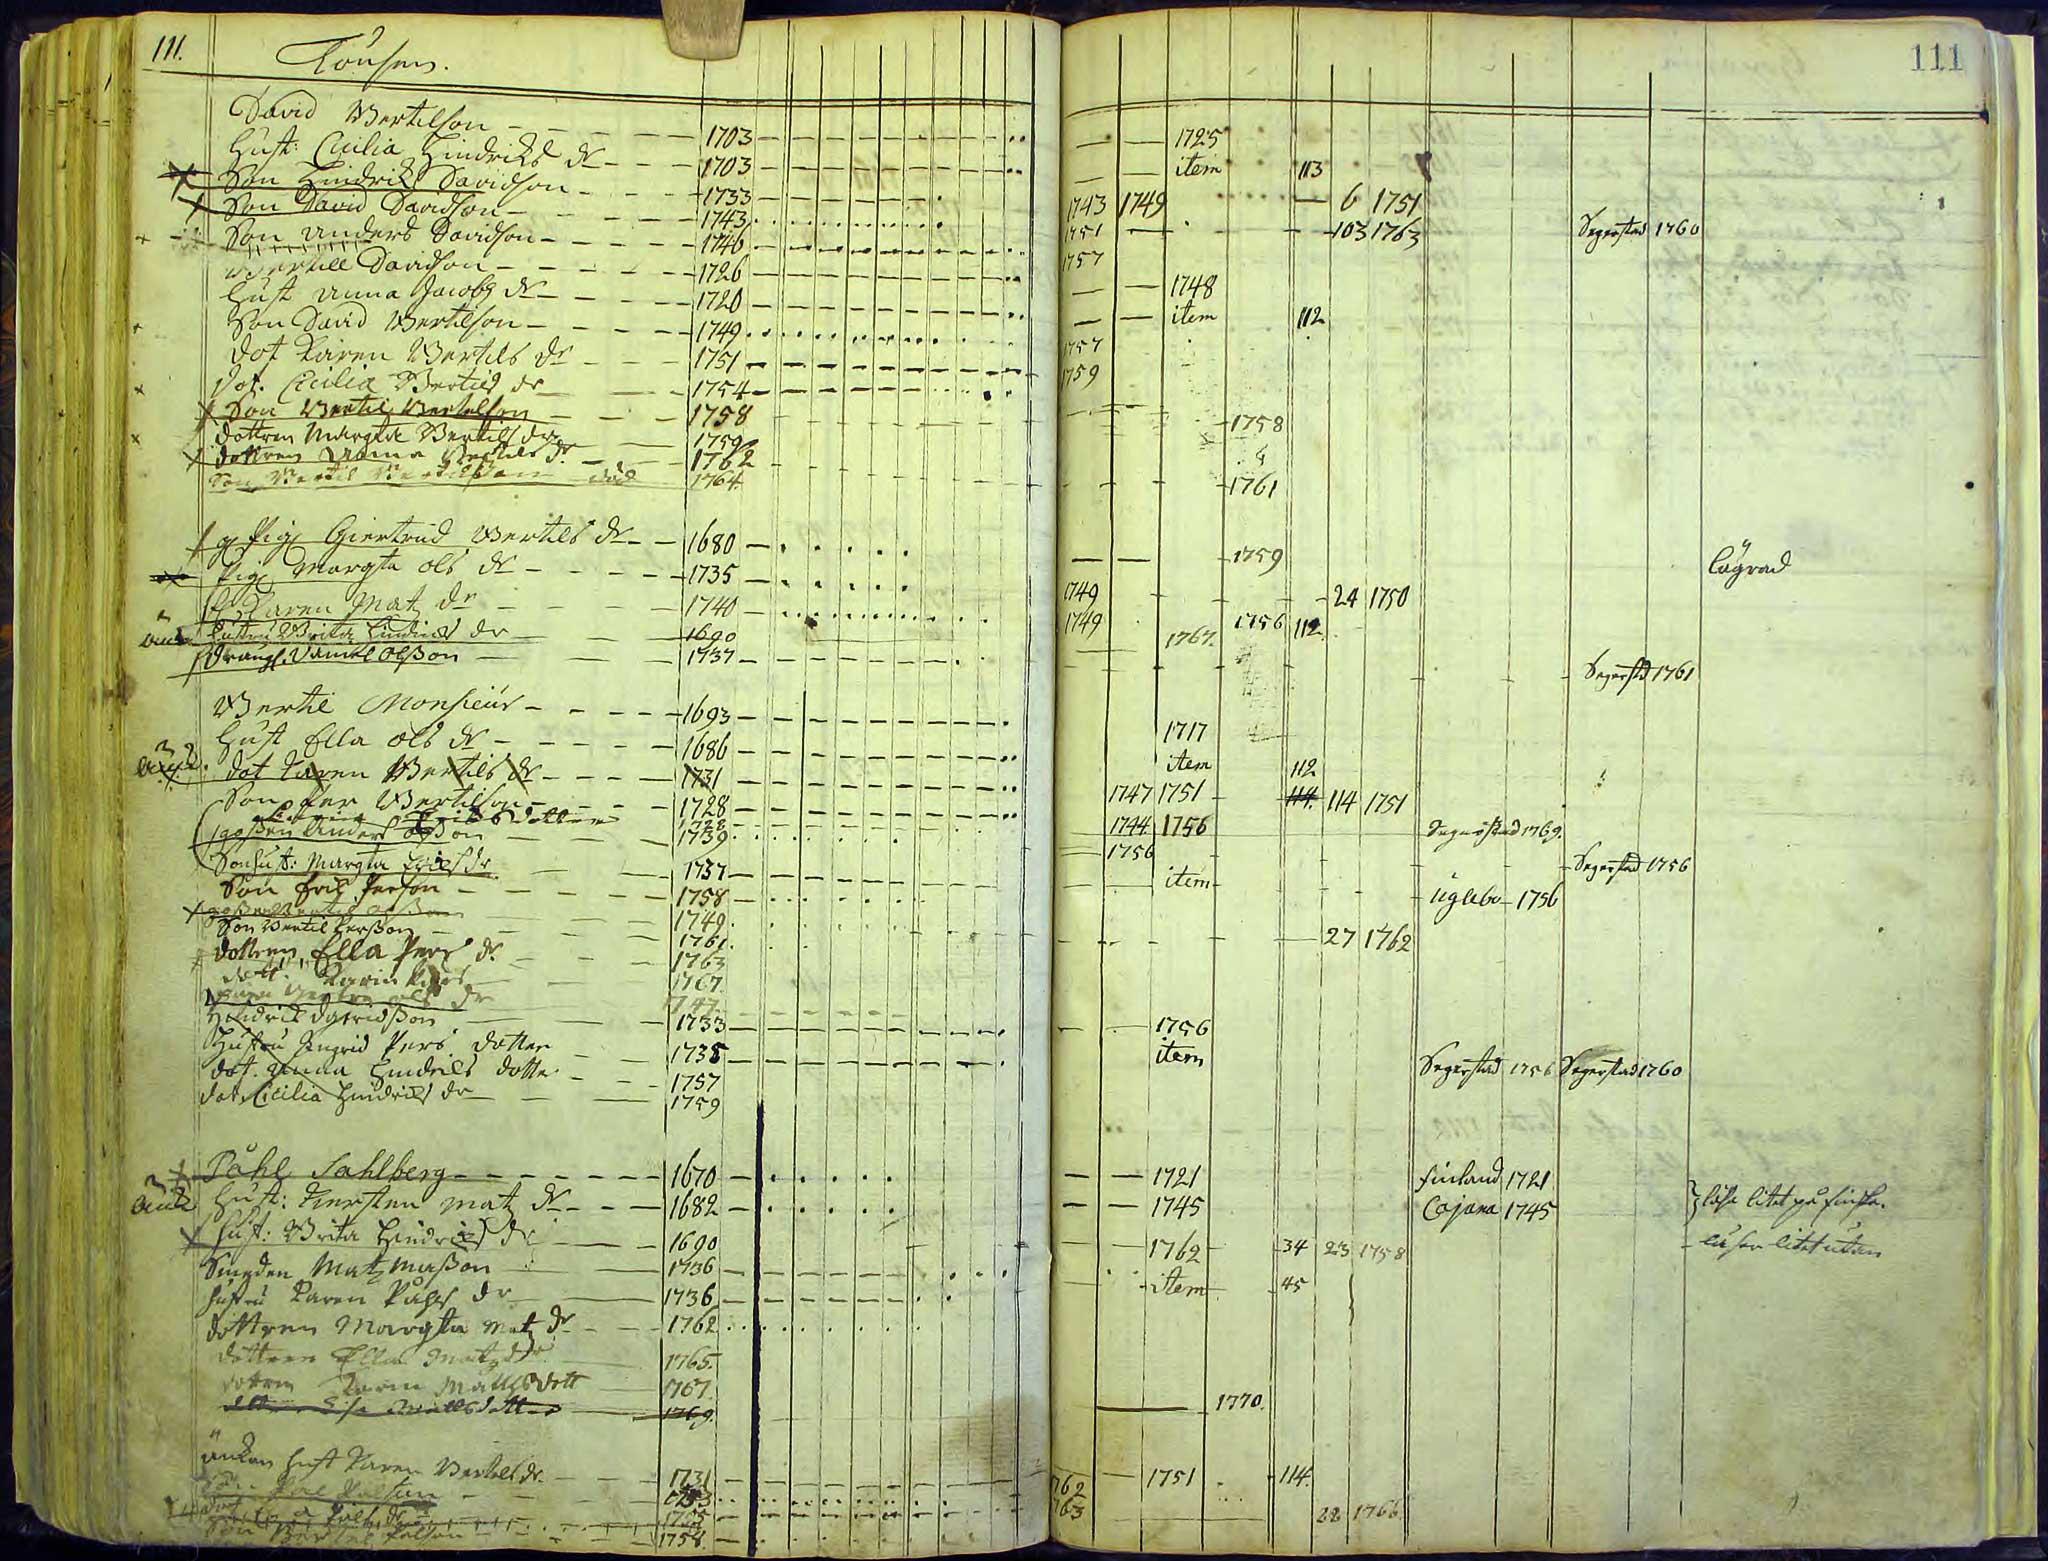 Hanebo A:1 1748-1773, sida 111